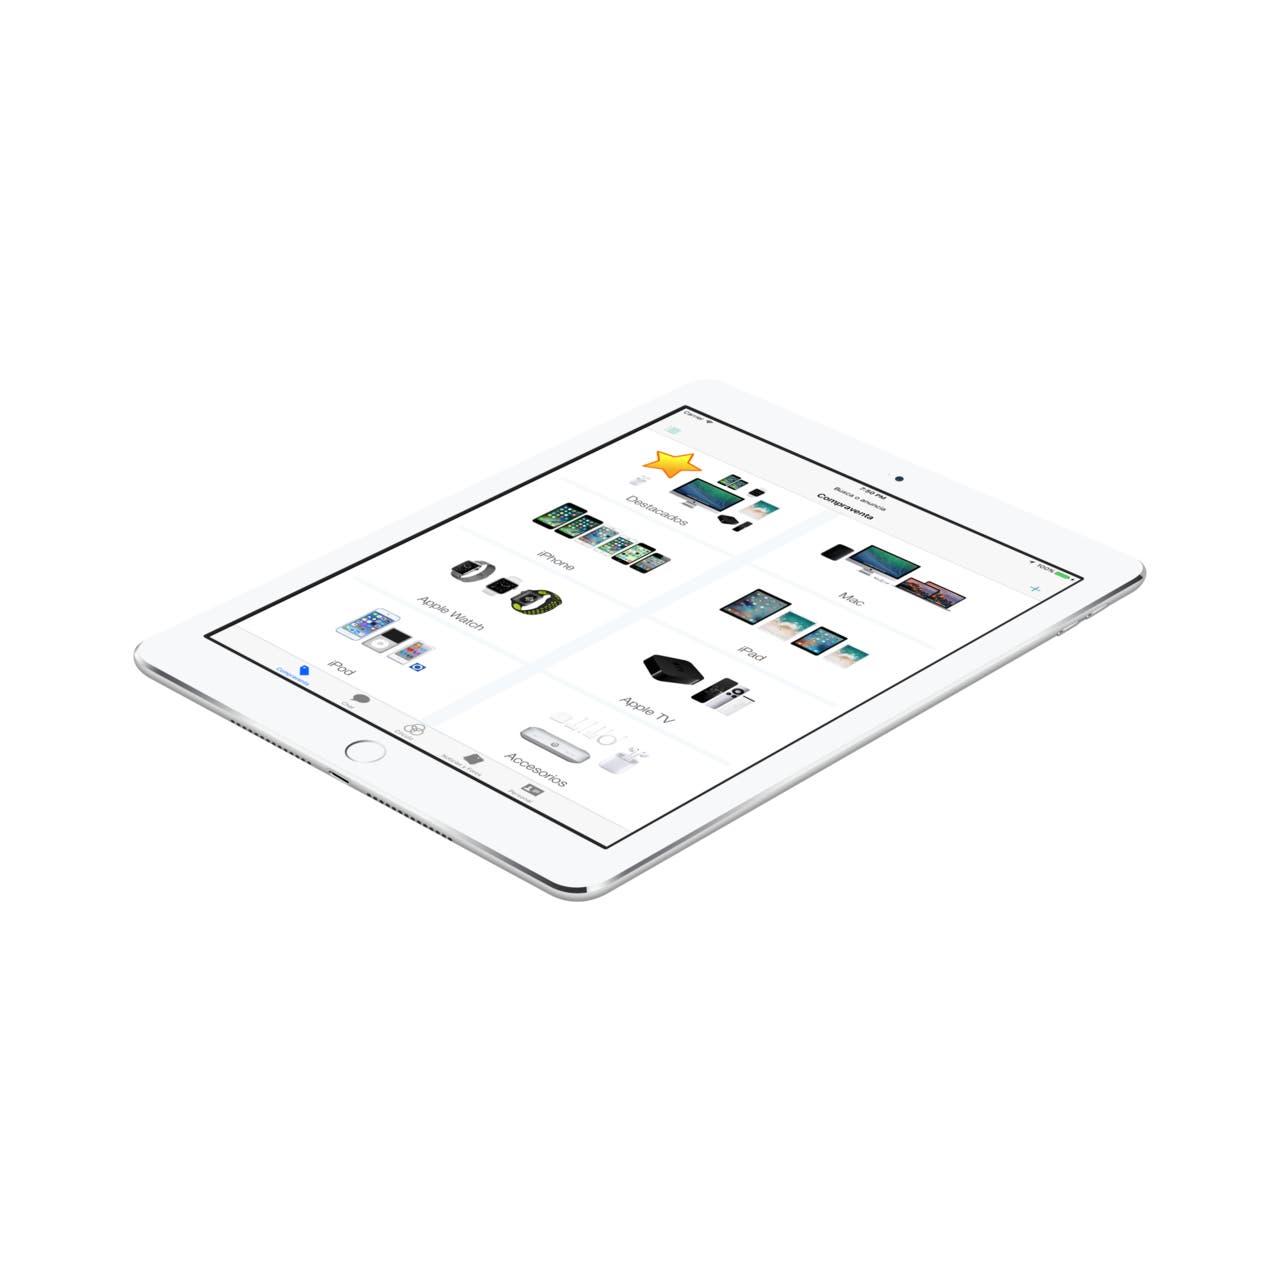 Markepple iPad nueva imagen